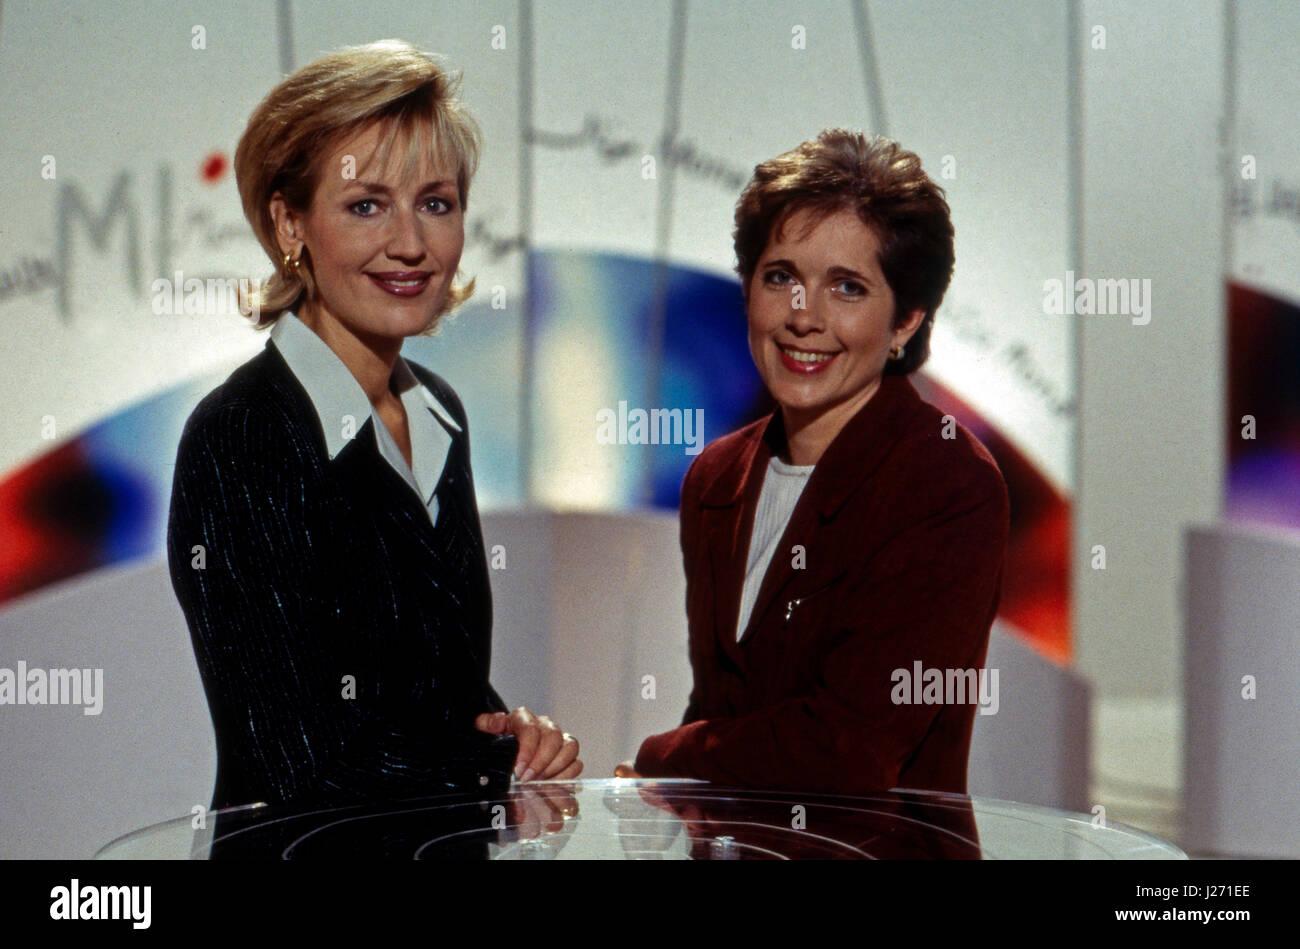 ML Mona Lisa, Fraueninformationssendung, Deutschland 1997, Moderation: Petra Gerster (links), Conny Hermann - Stock Image